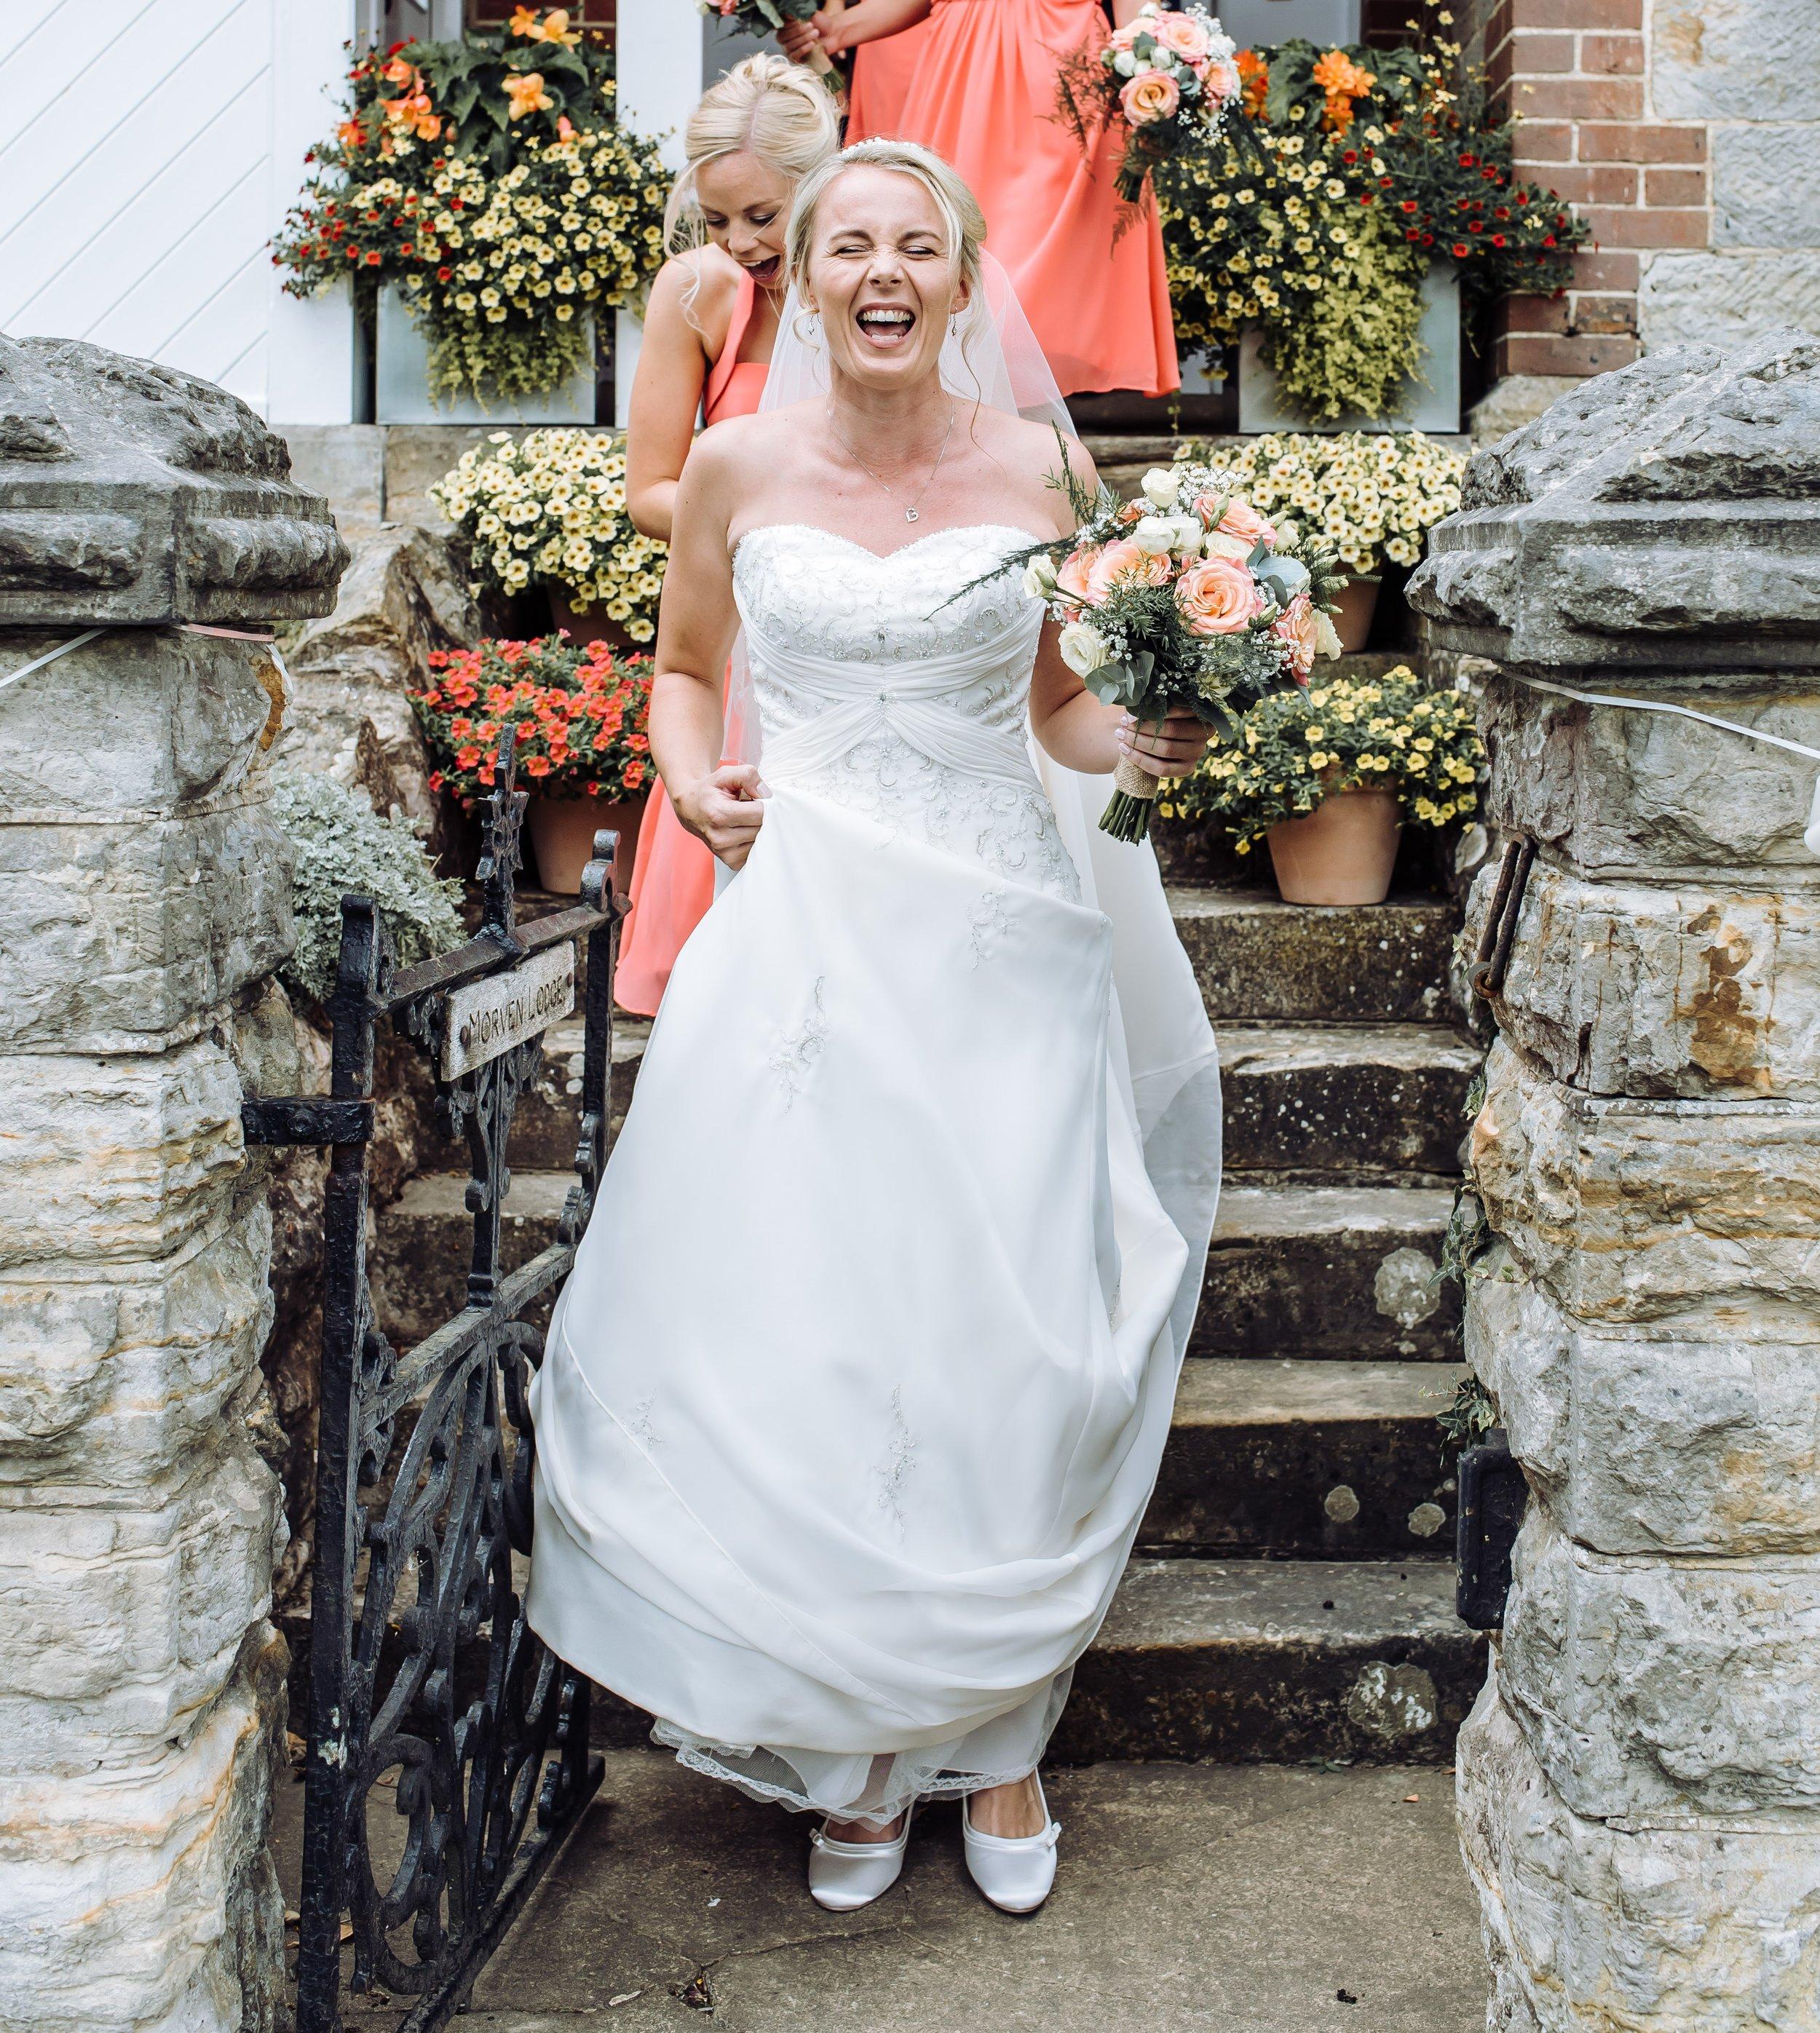 Vintage Wedding - East Sussex Wedding Photographer_0177.jpg